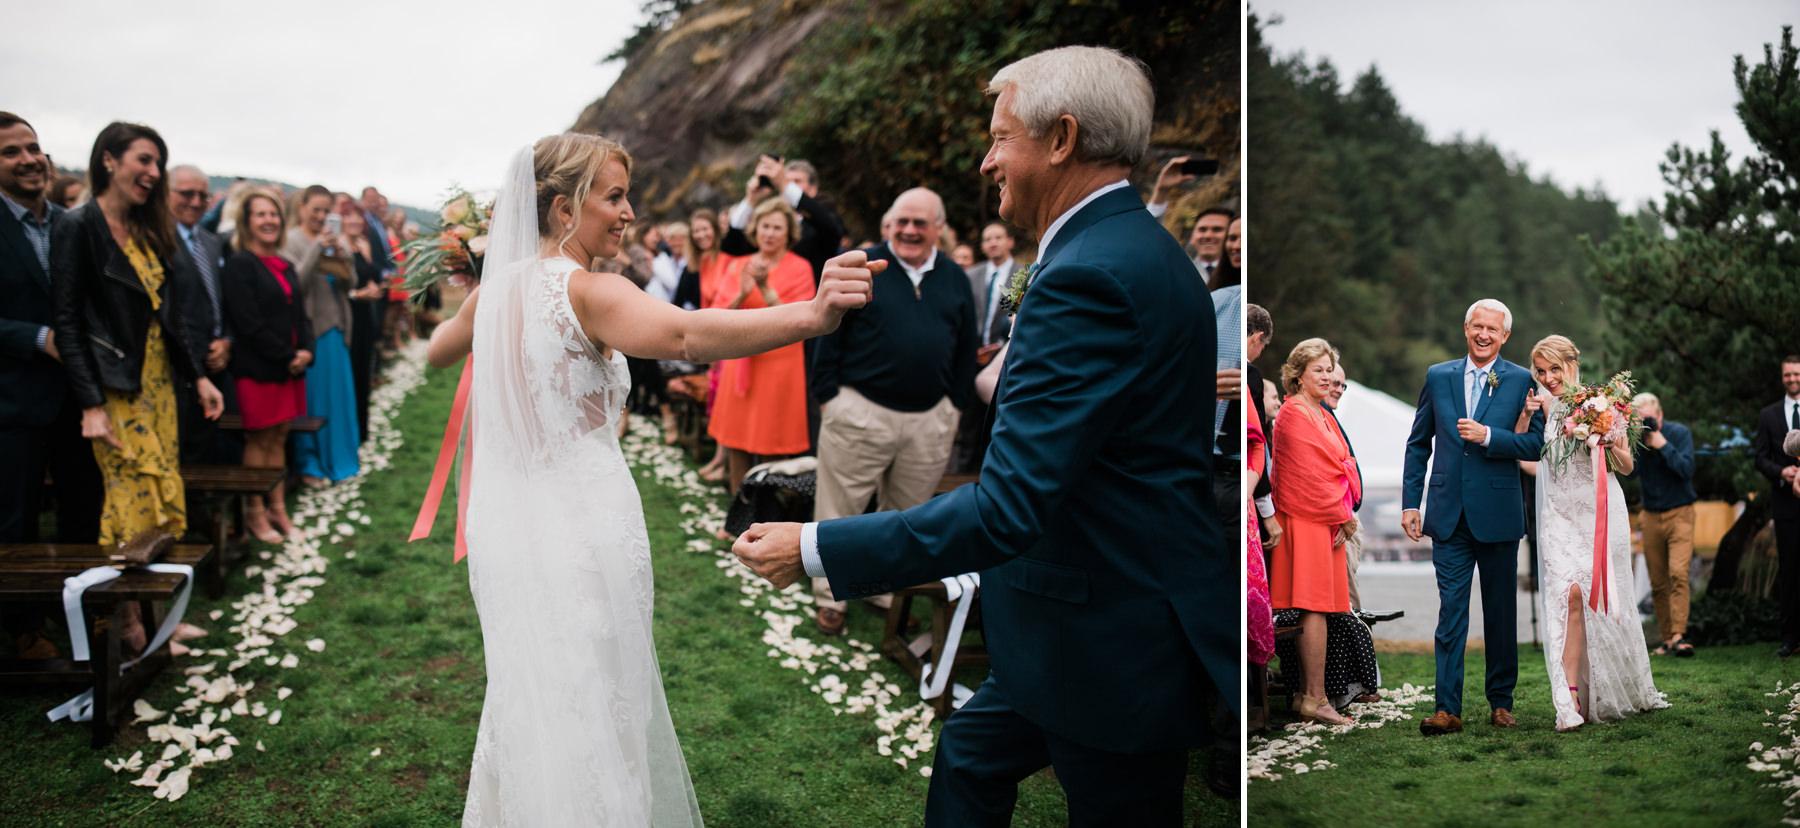 318-colorful-outdoor-lopez-island-wedding.jpg